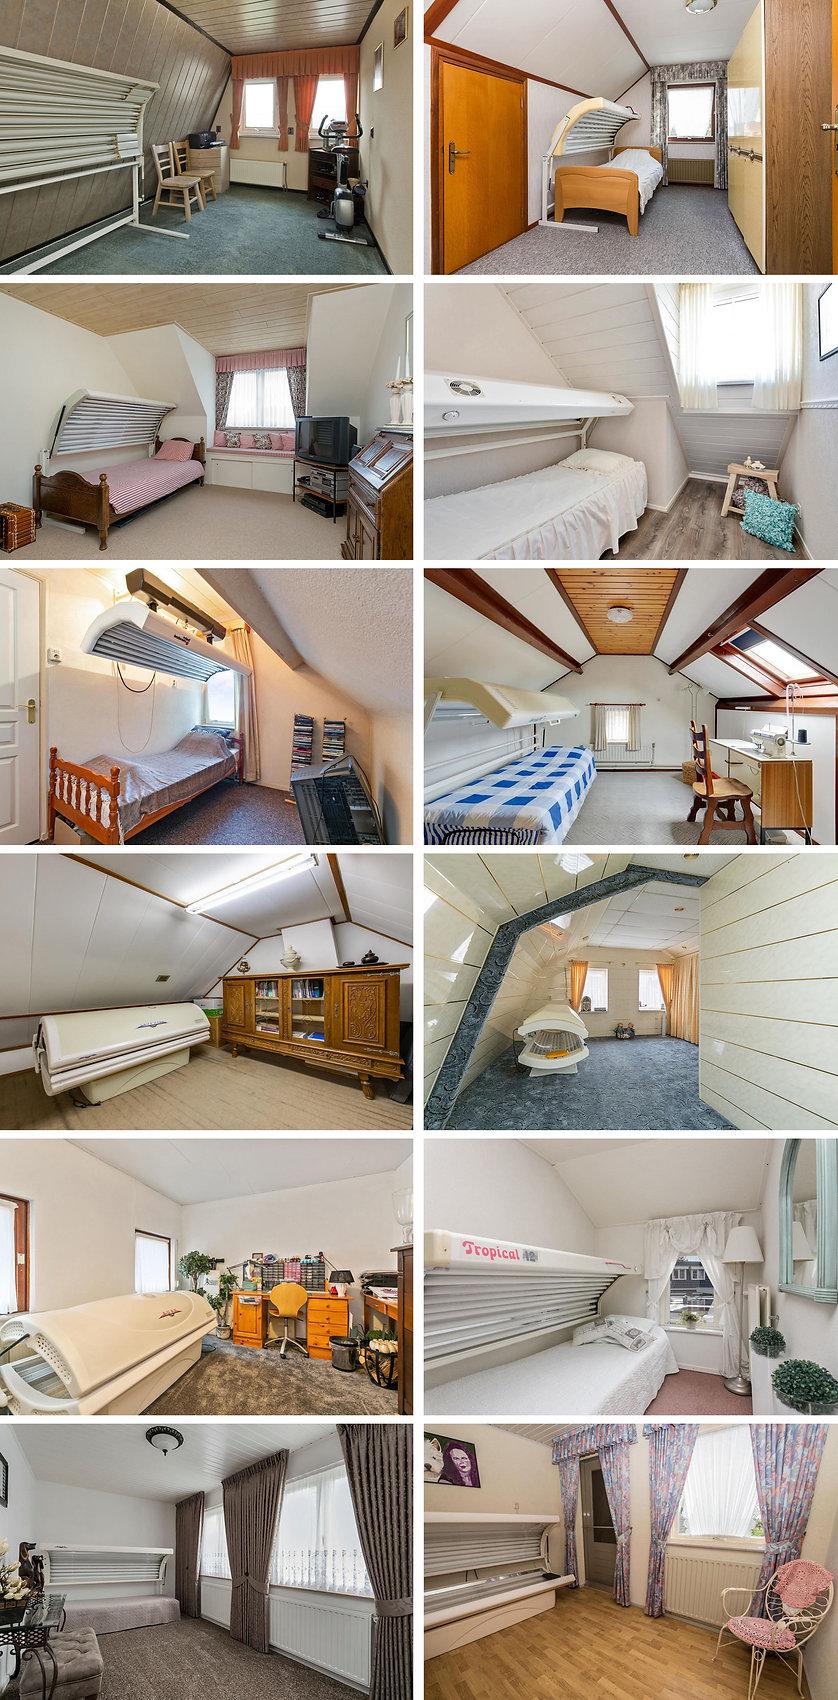 #interior %22Tanning beds%22.jpg